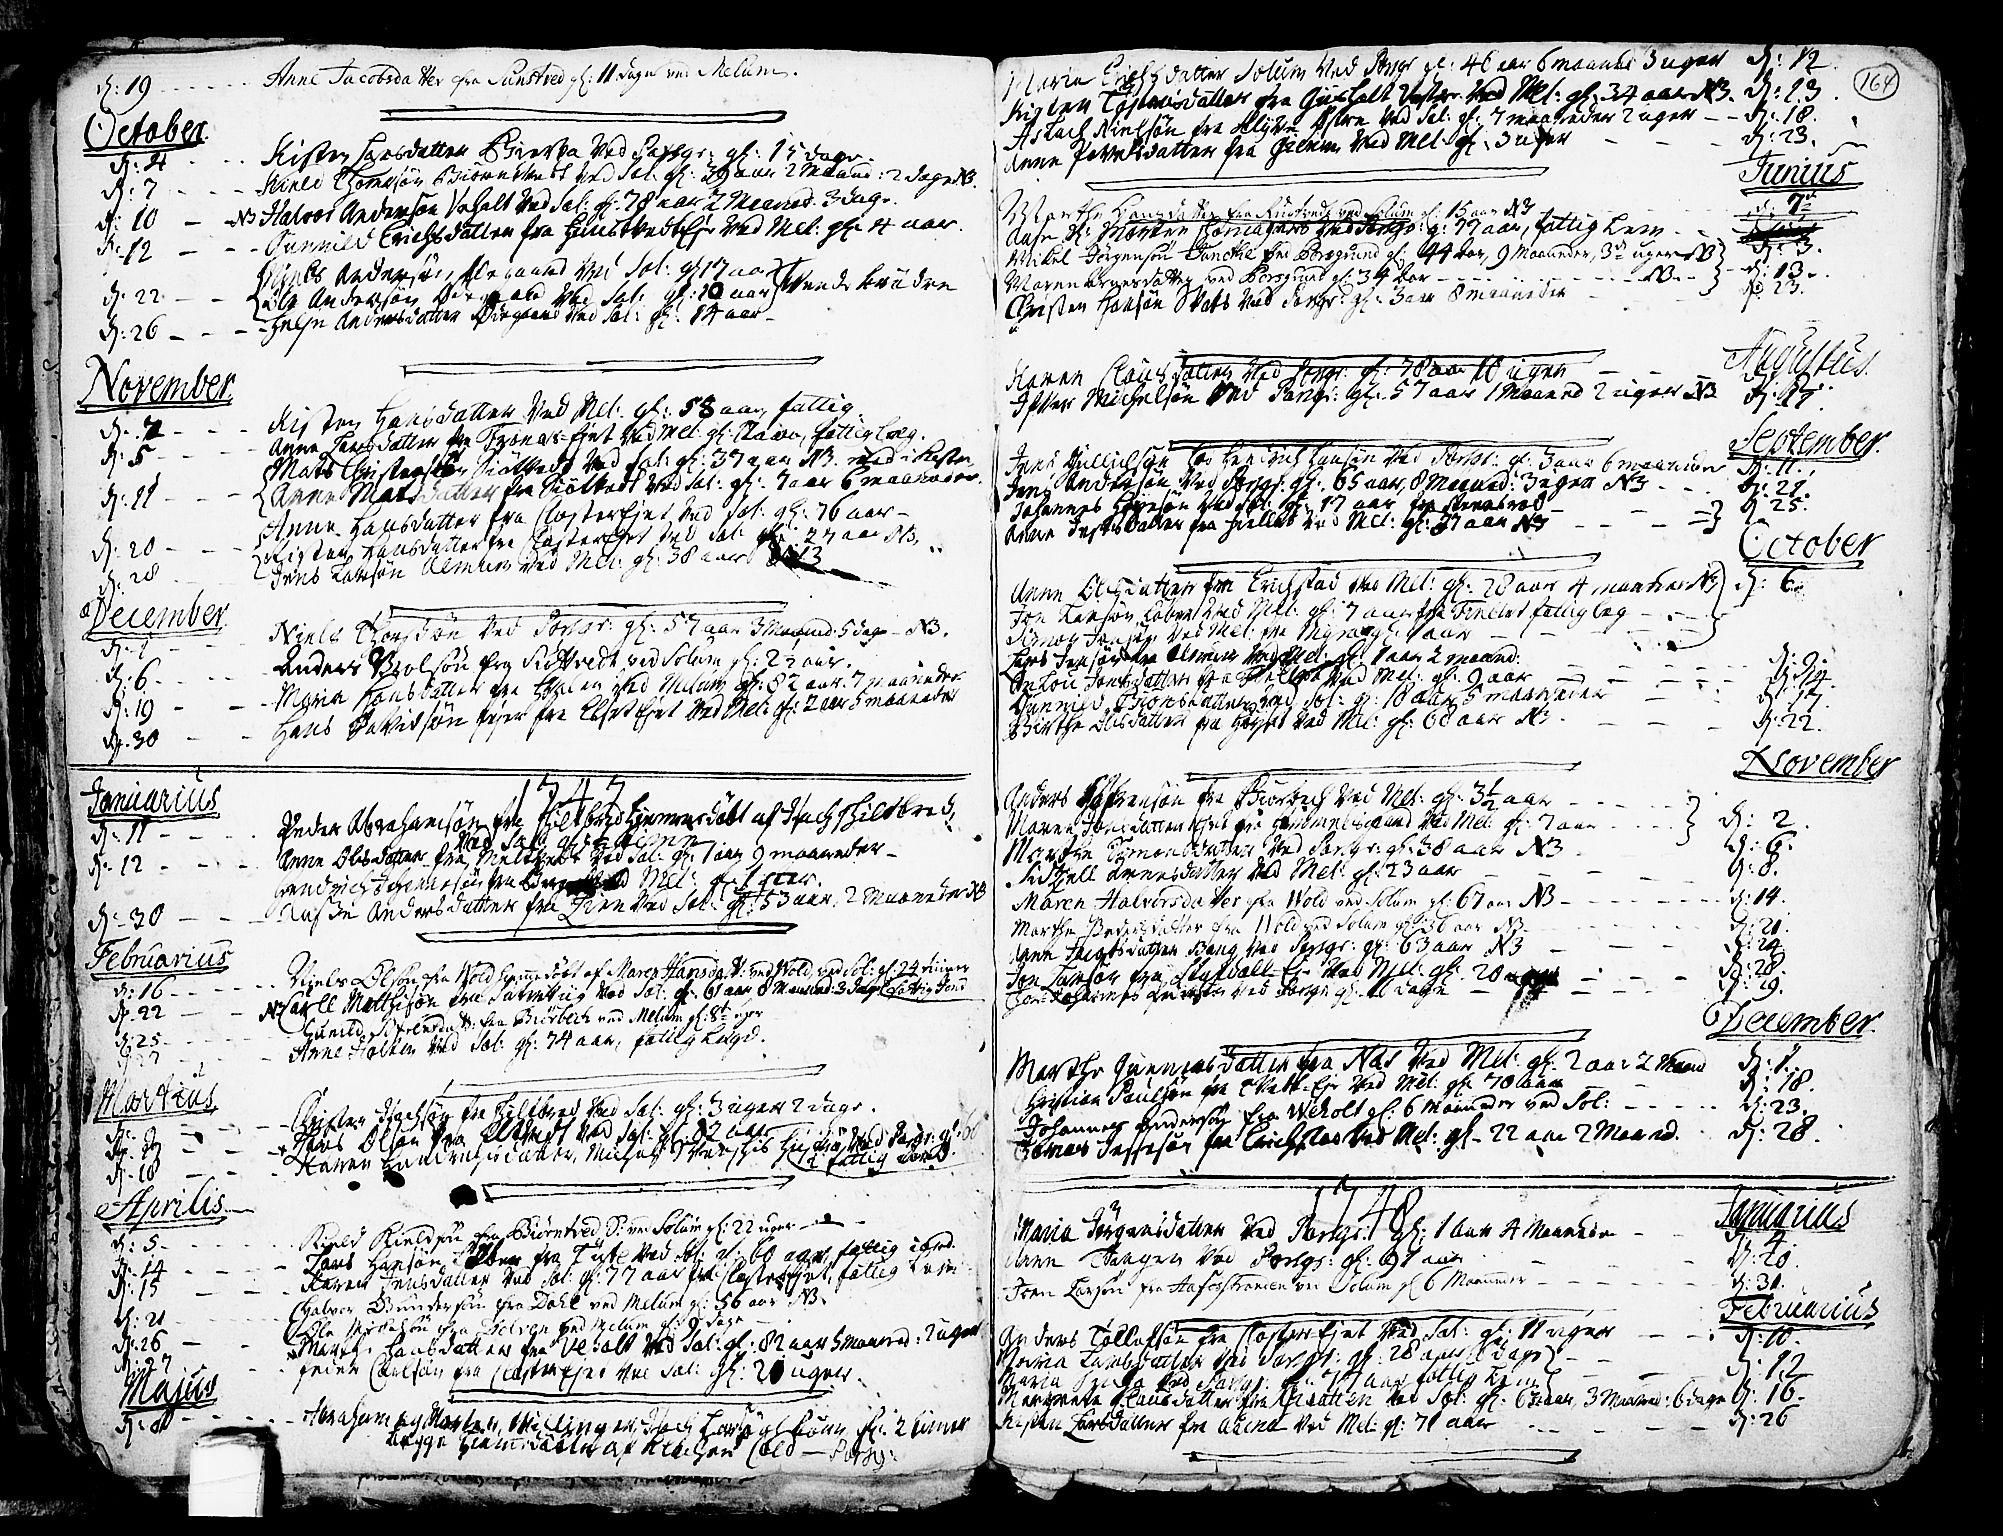 SAKO, Solum kirkebøker, F/Fa/L0002: Ministerialbok nr. I 2, 1713-1761, s. 164